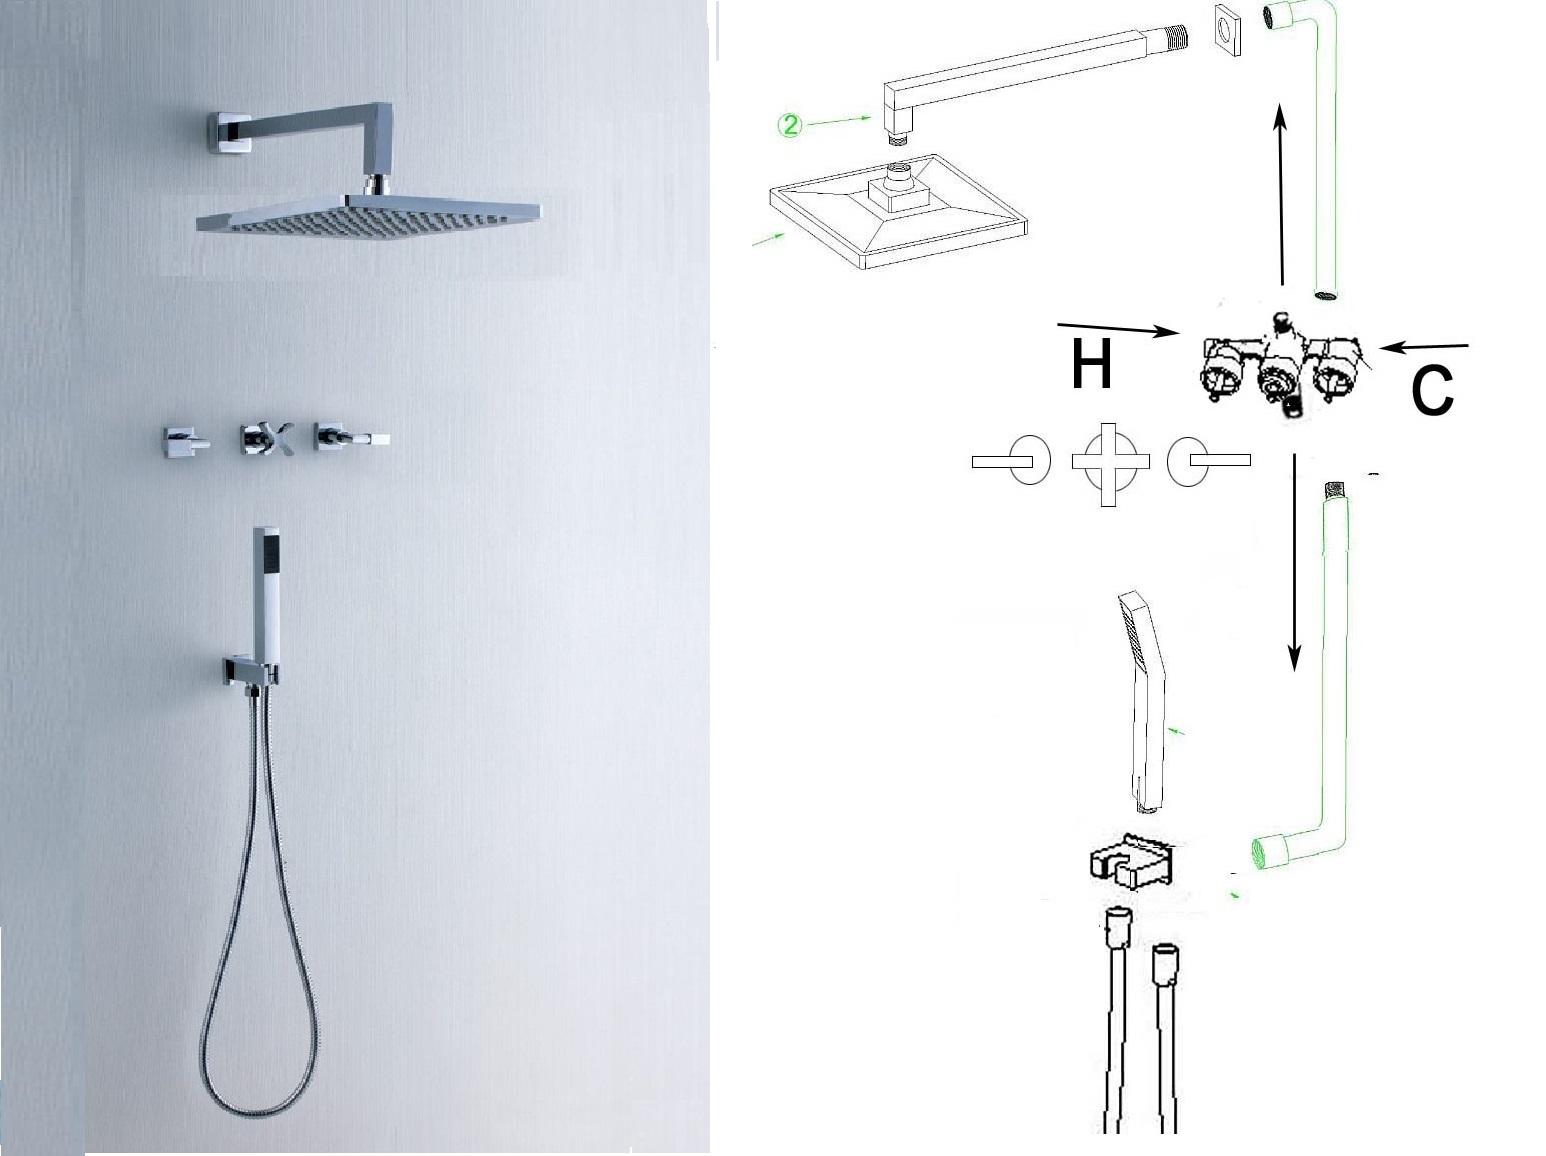 Kraus Shower Set Installation Instructions Bathselect Blog